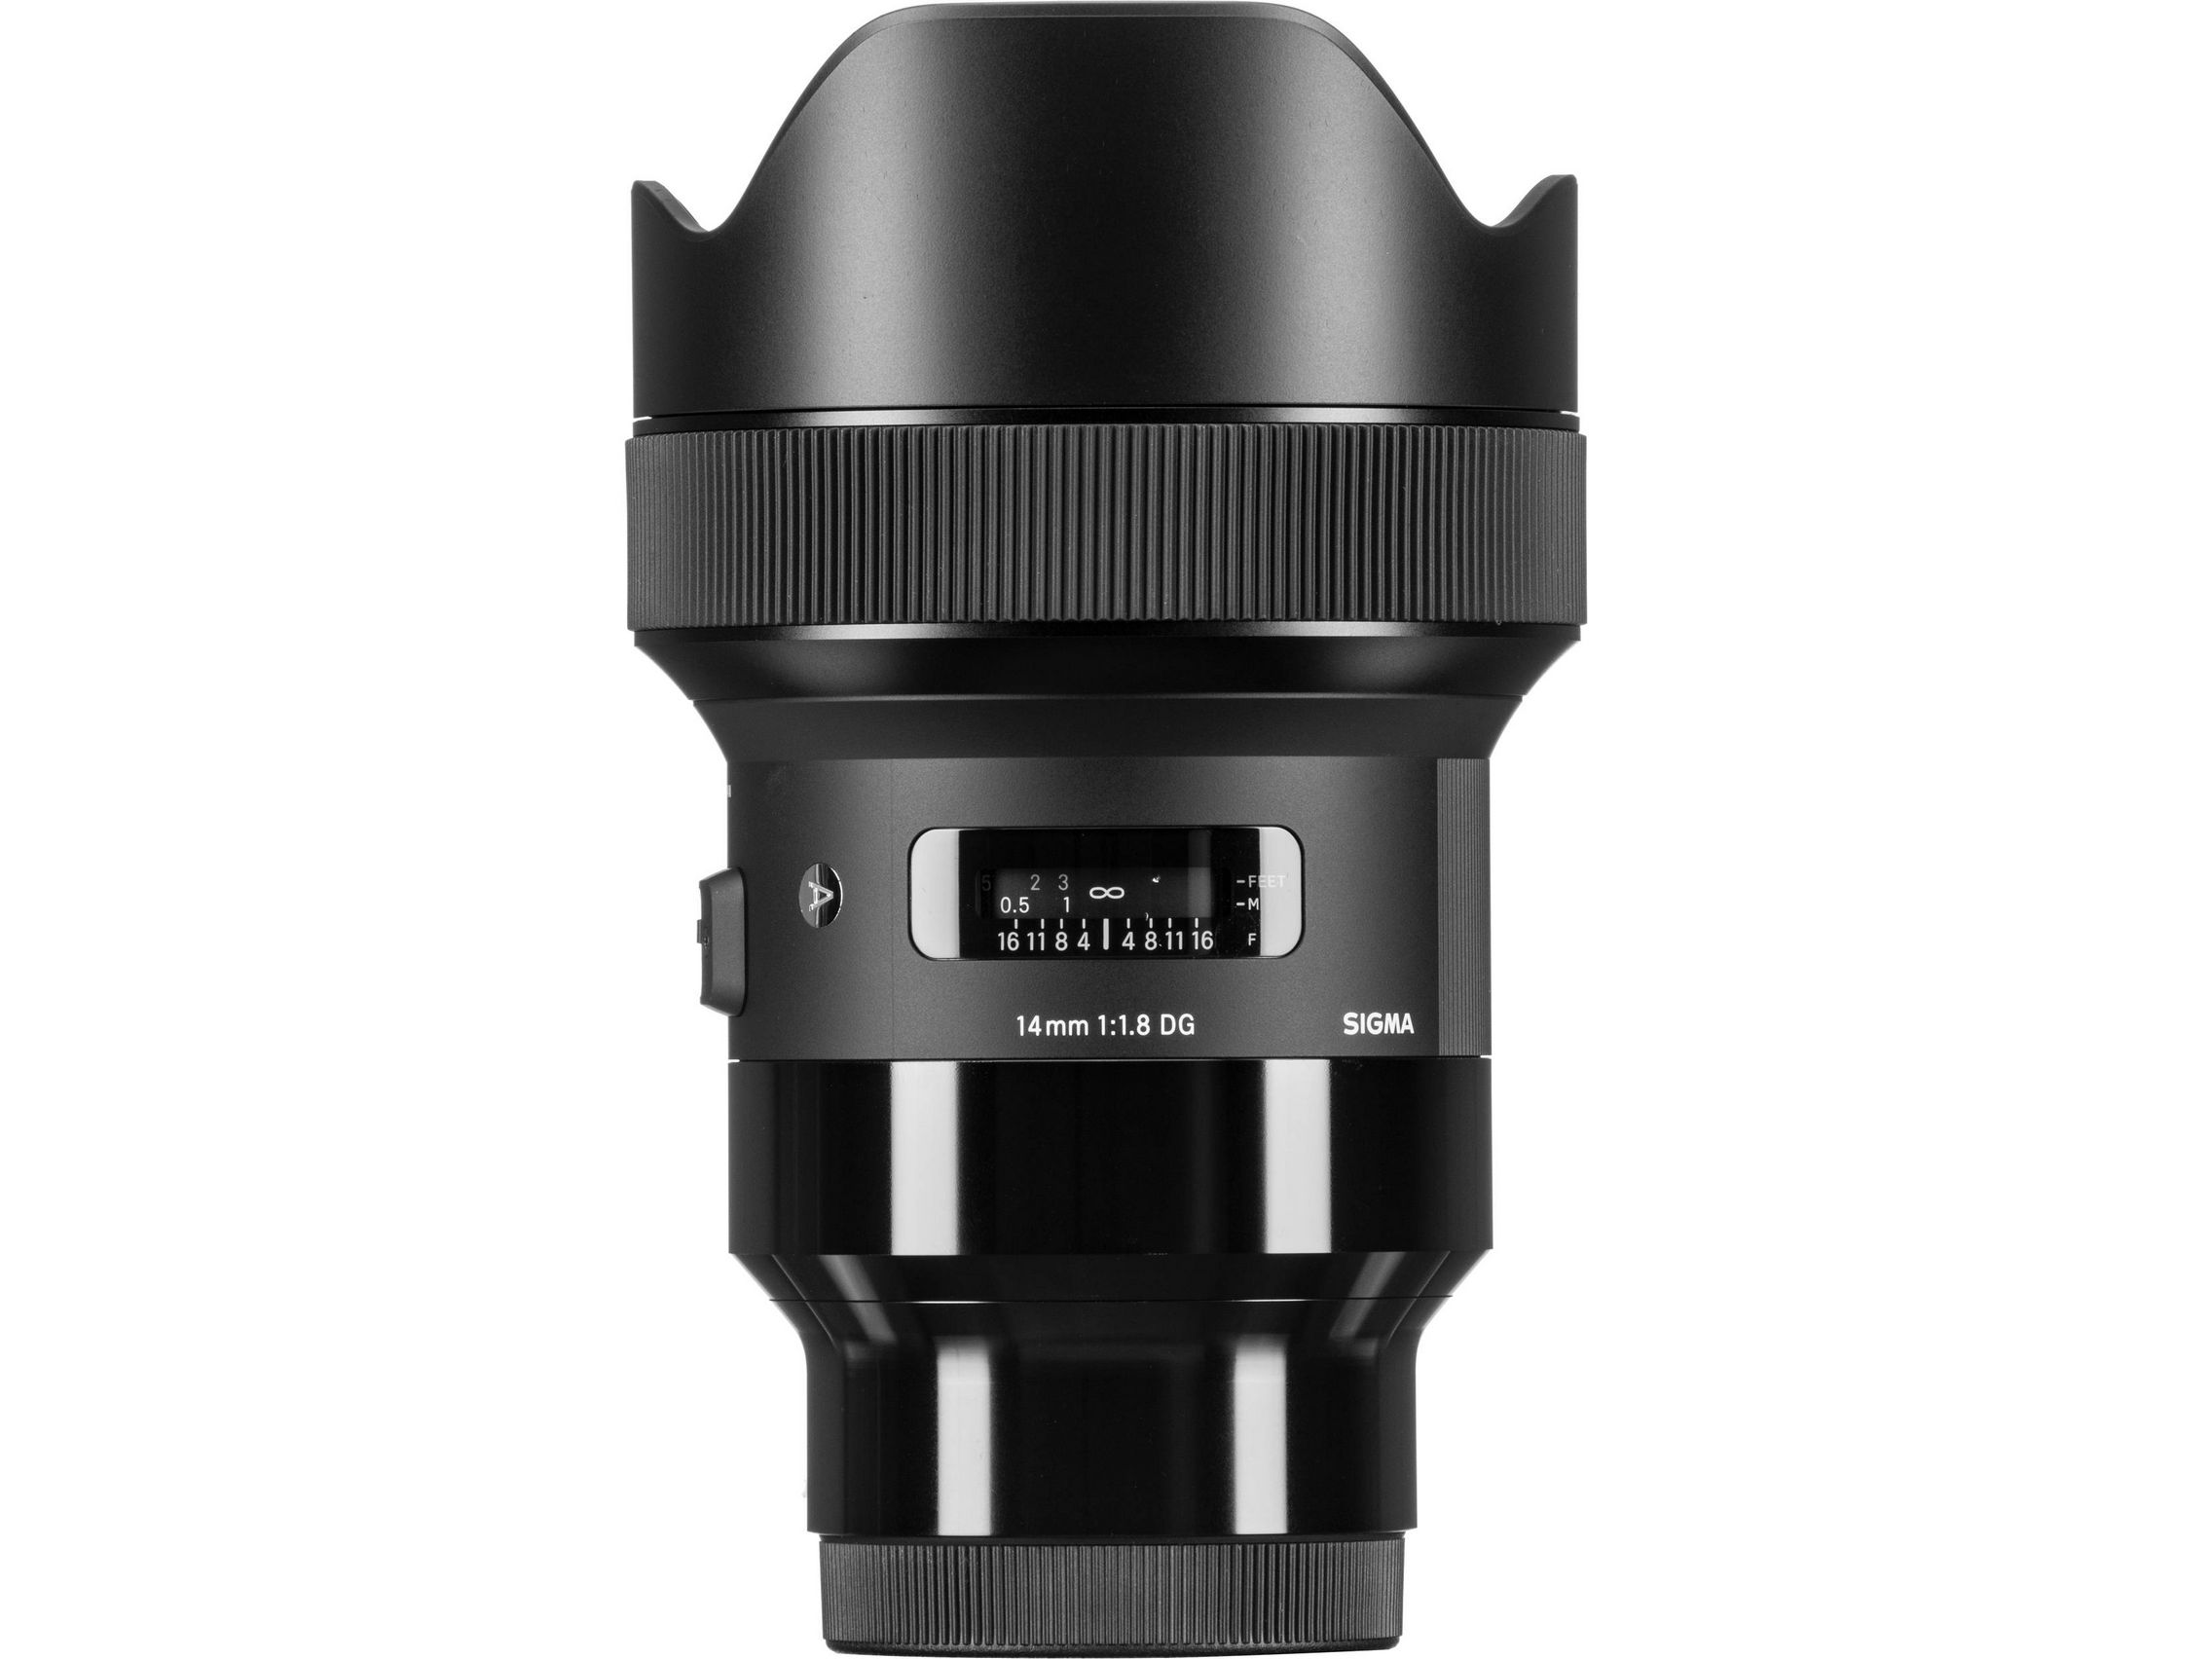 Sigma 14mm 1:1.8 DG A (ART)